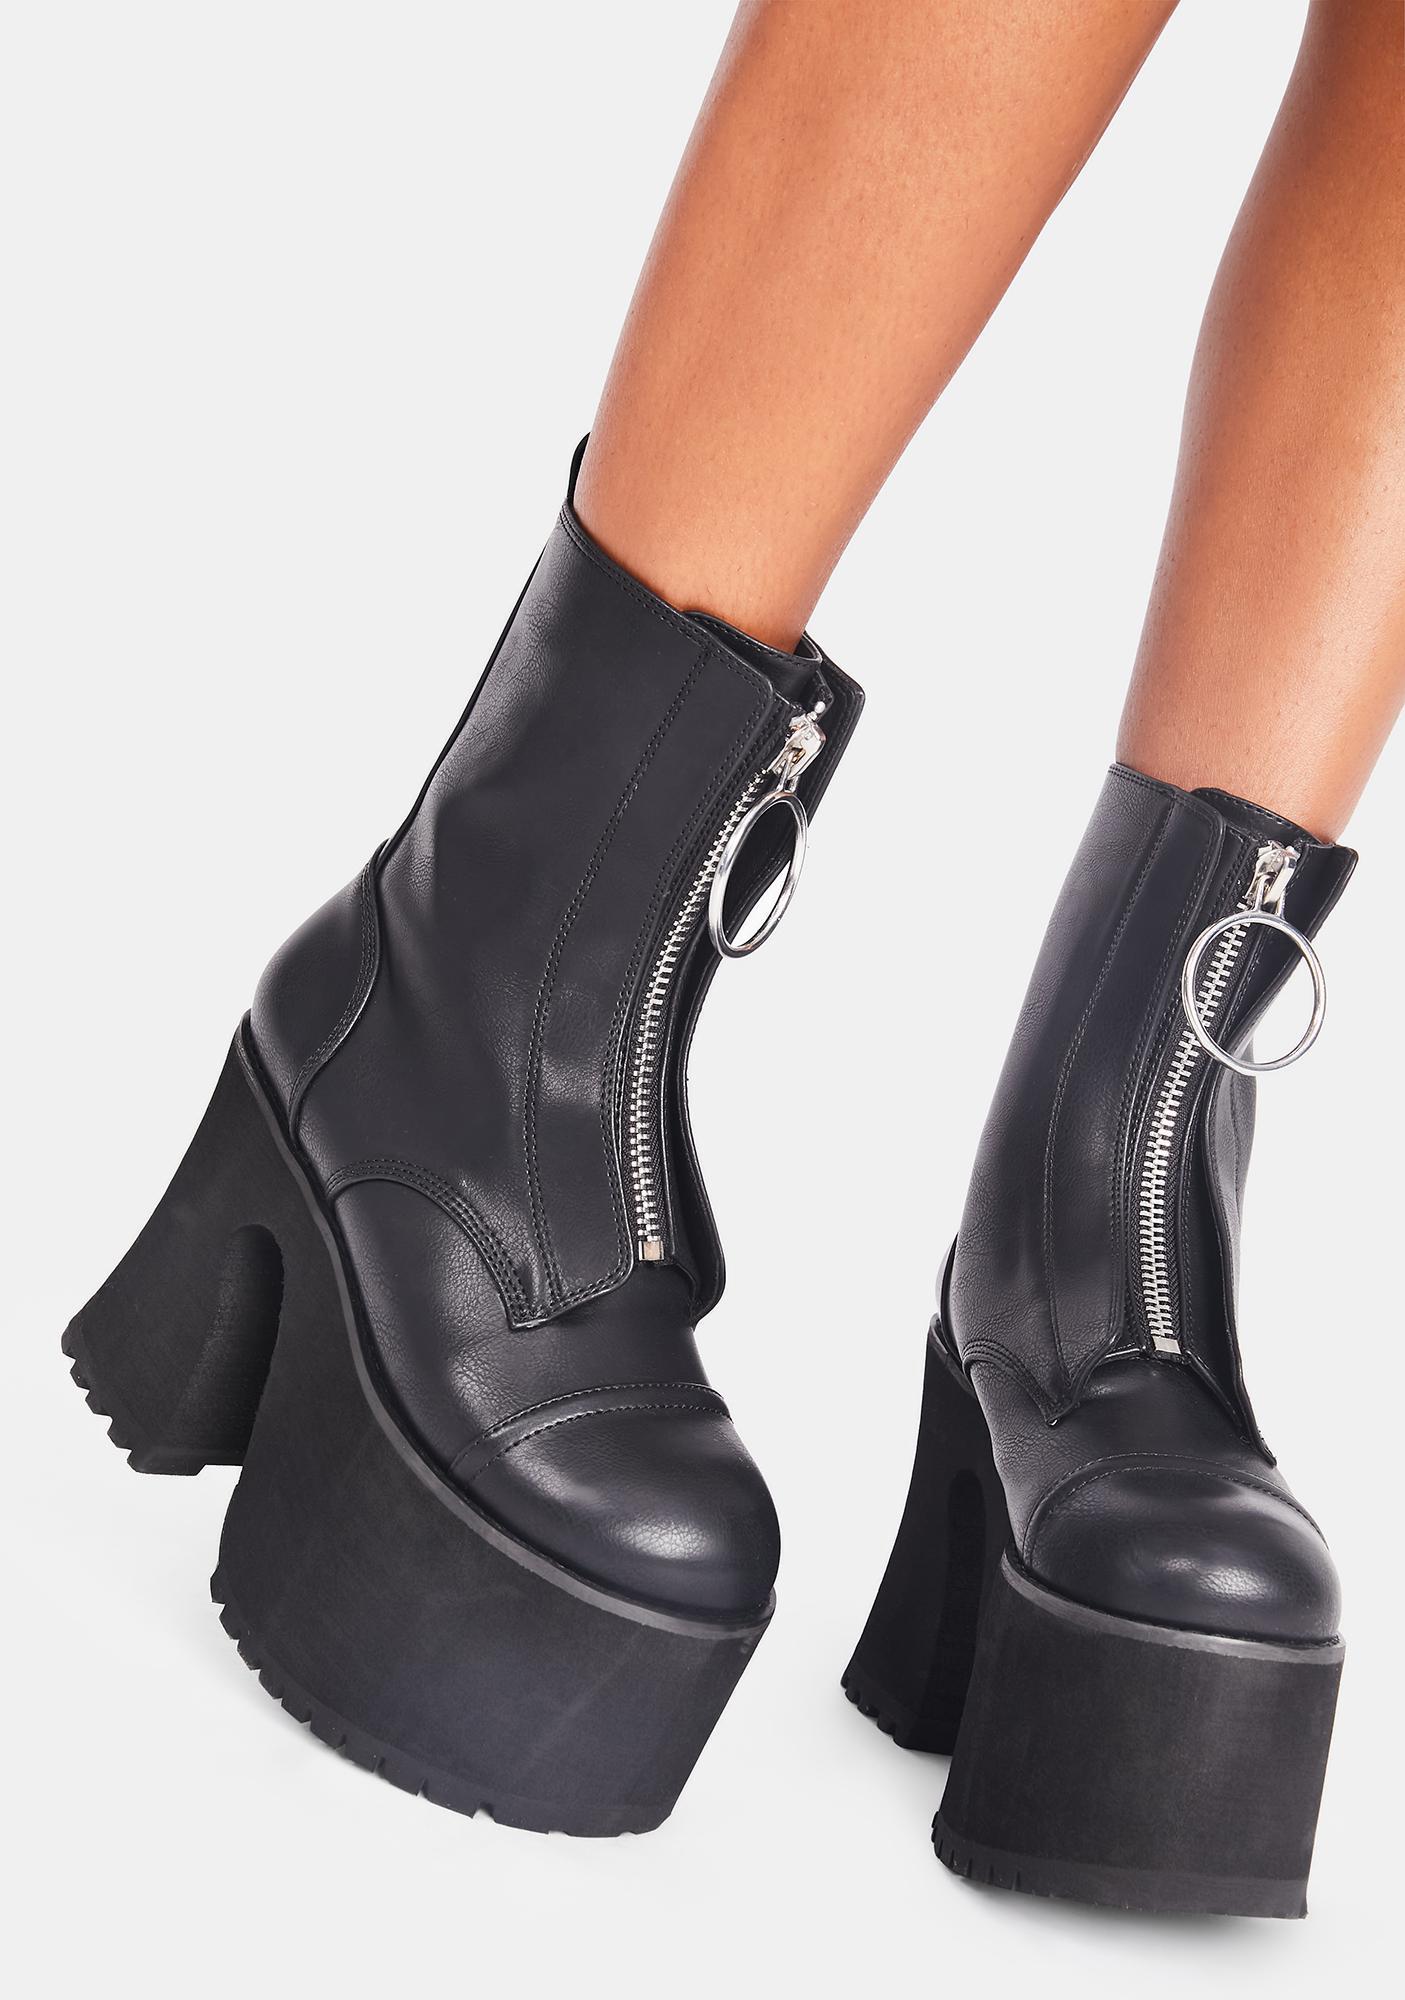 Platform Boots - Black Vegan Leather